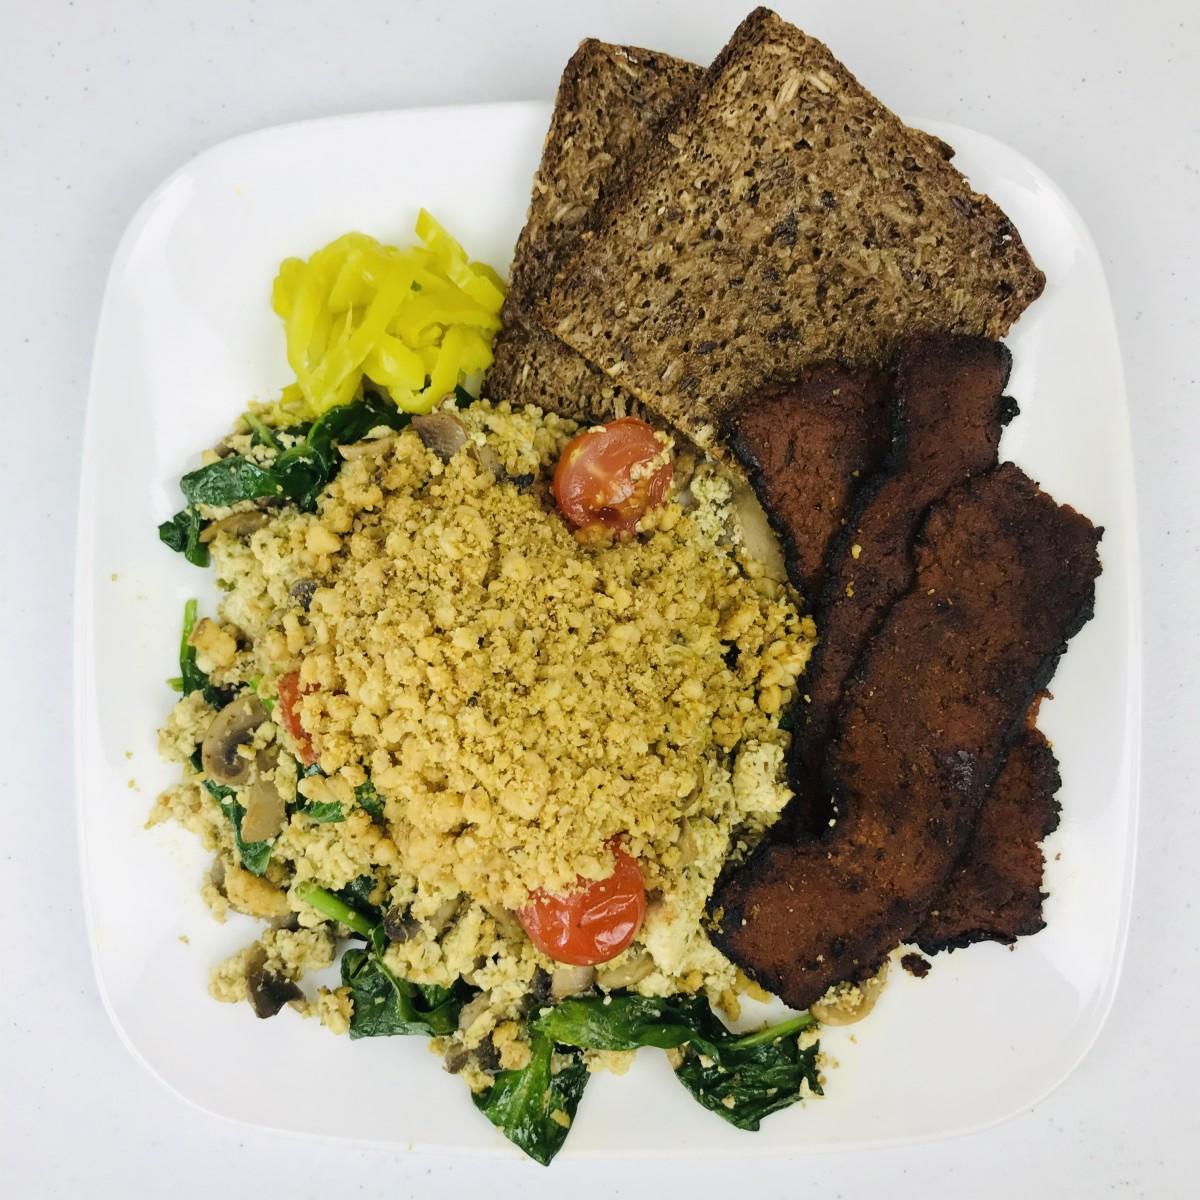 Vegan Breakfast Scramble With Pesto and Walnut Parmesan